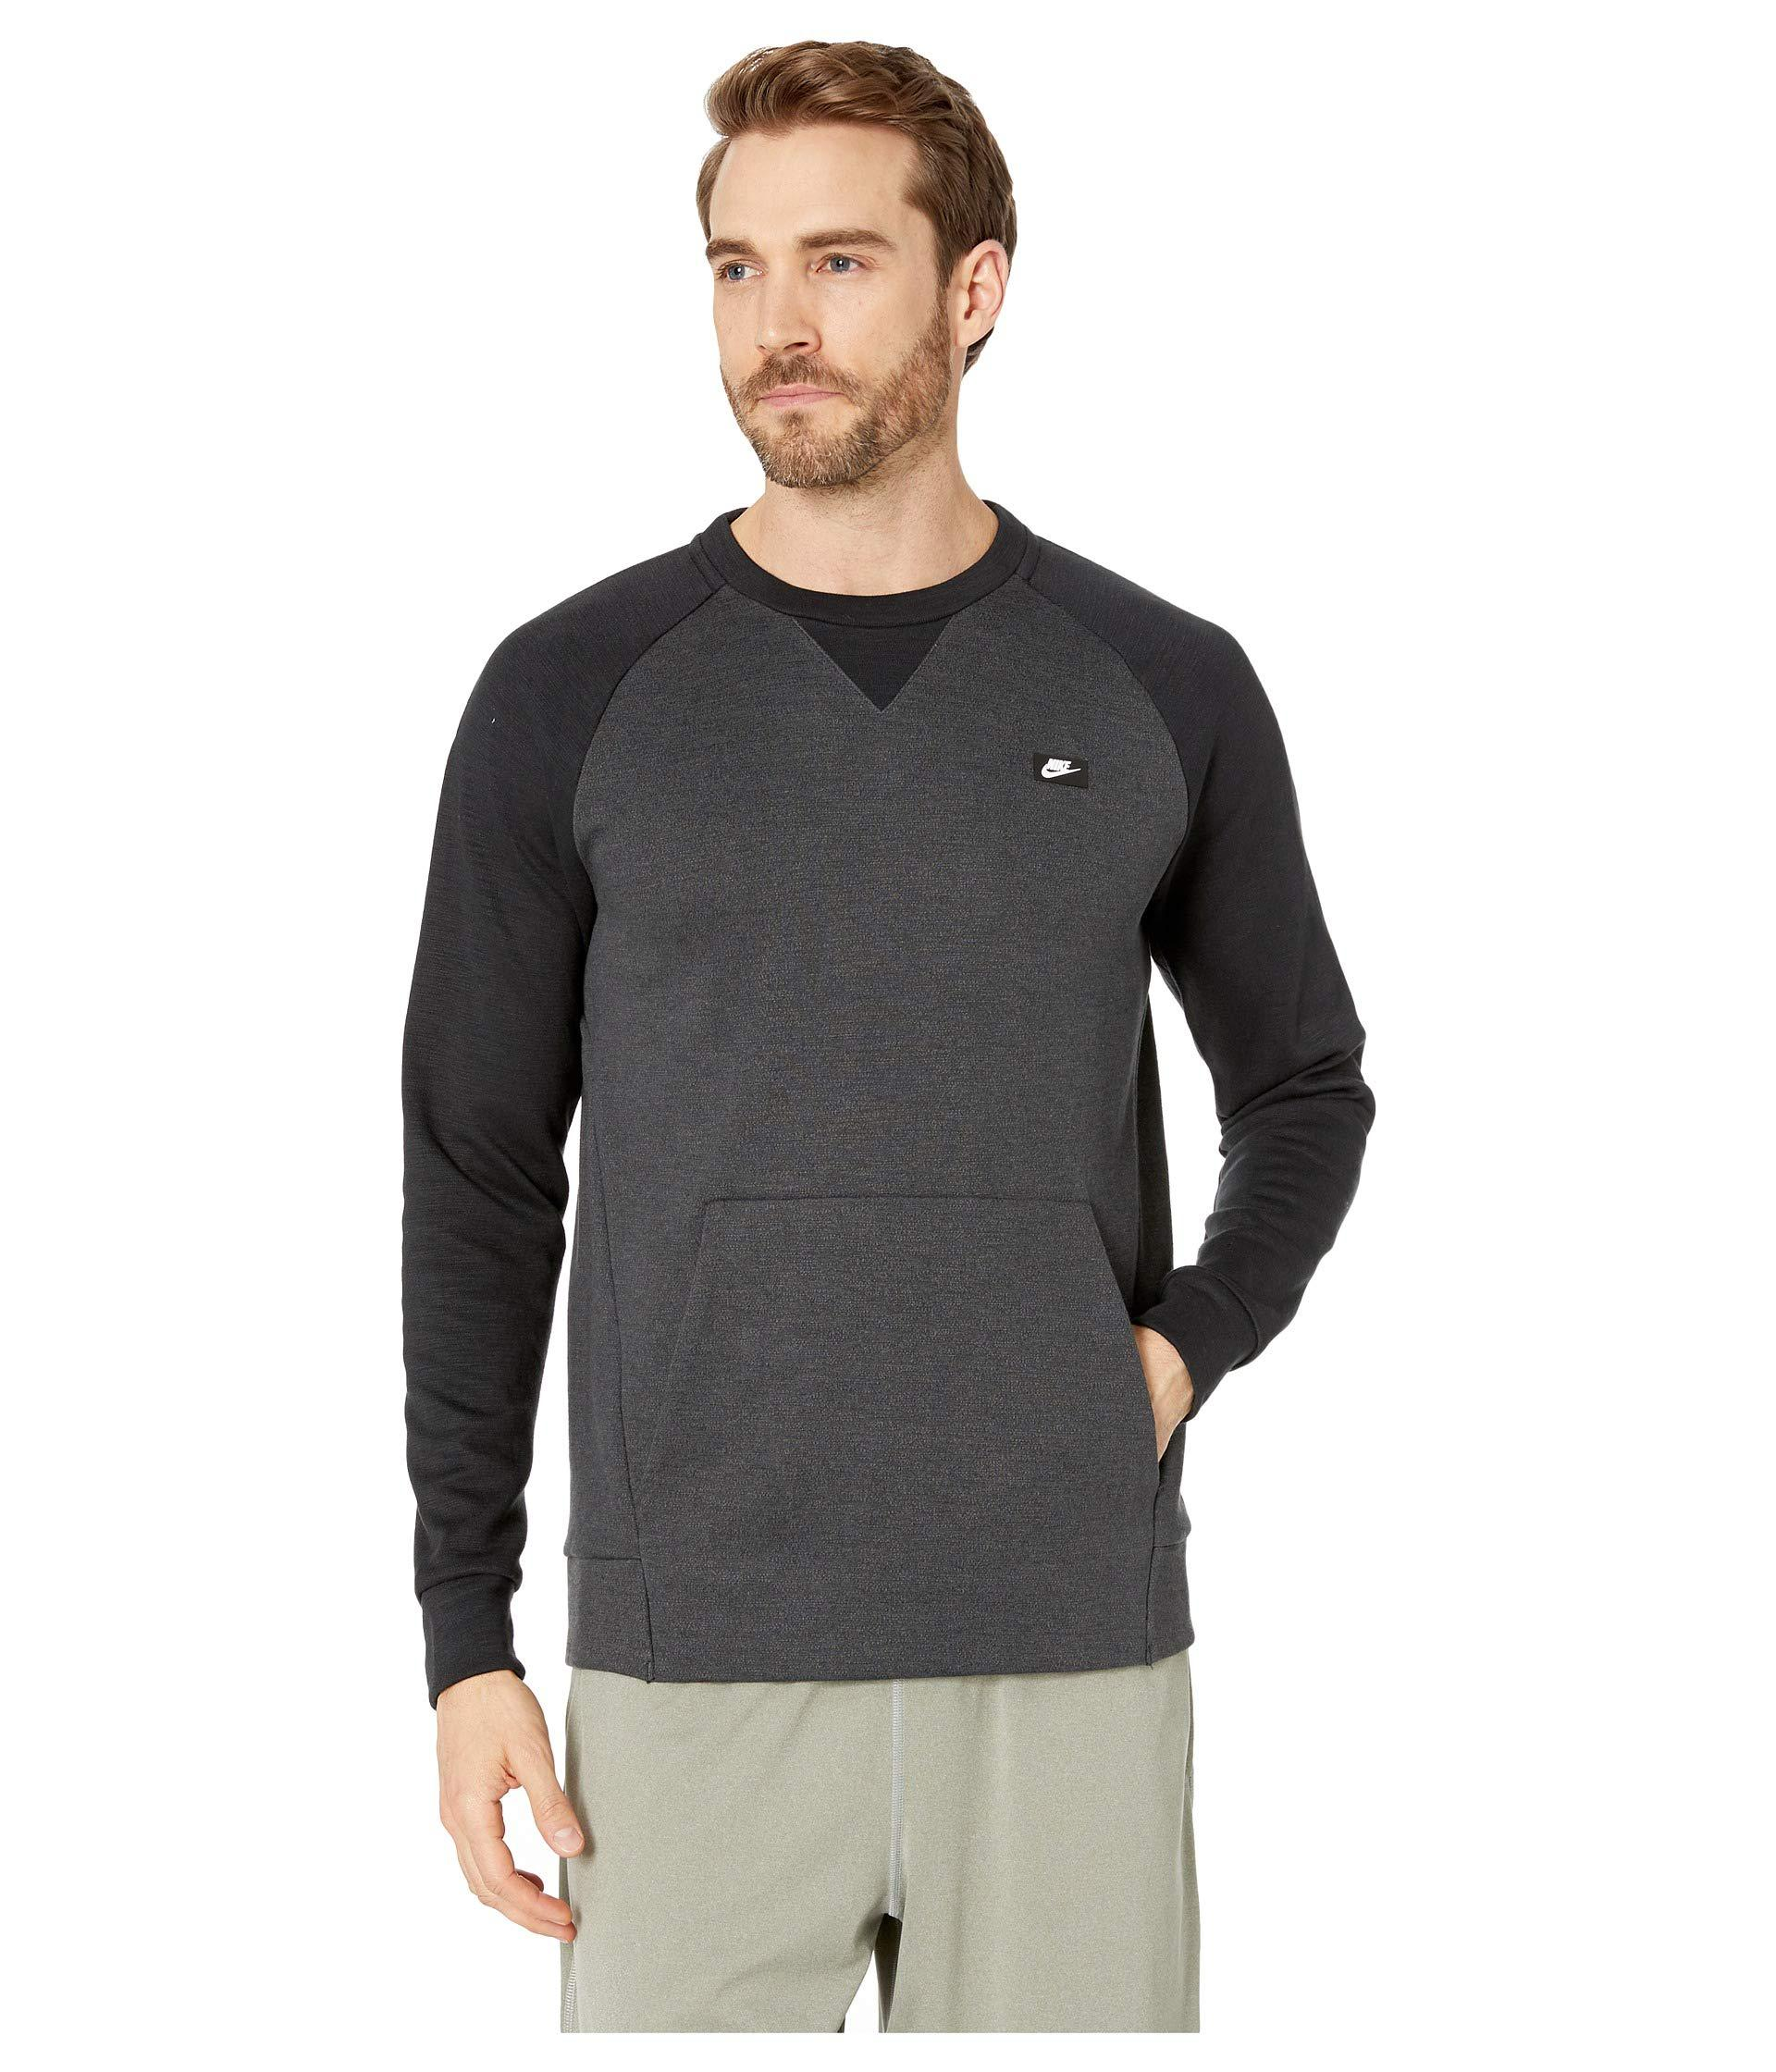 Lyst - Nike Nsw Optic Crew (dark Grey heather) Men s Clothing in ... 6426fb5f0